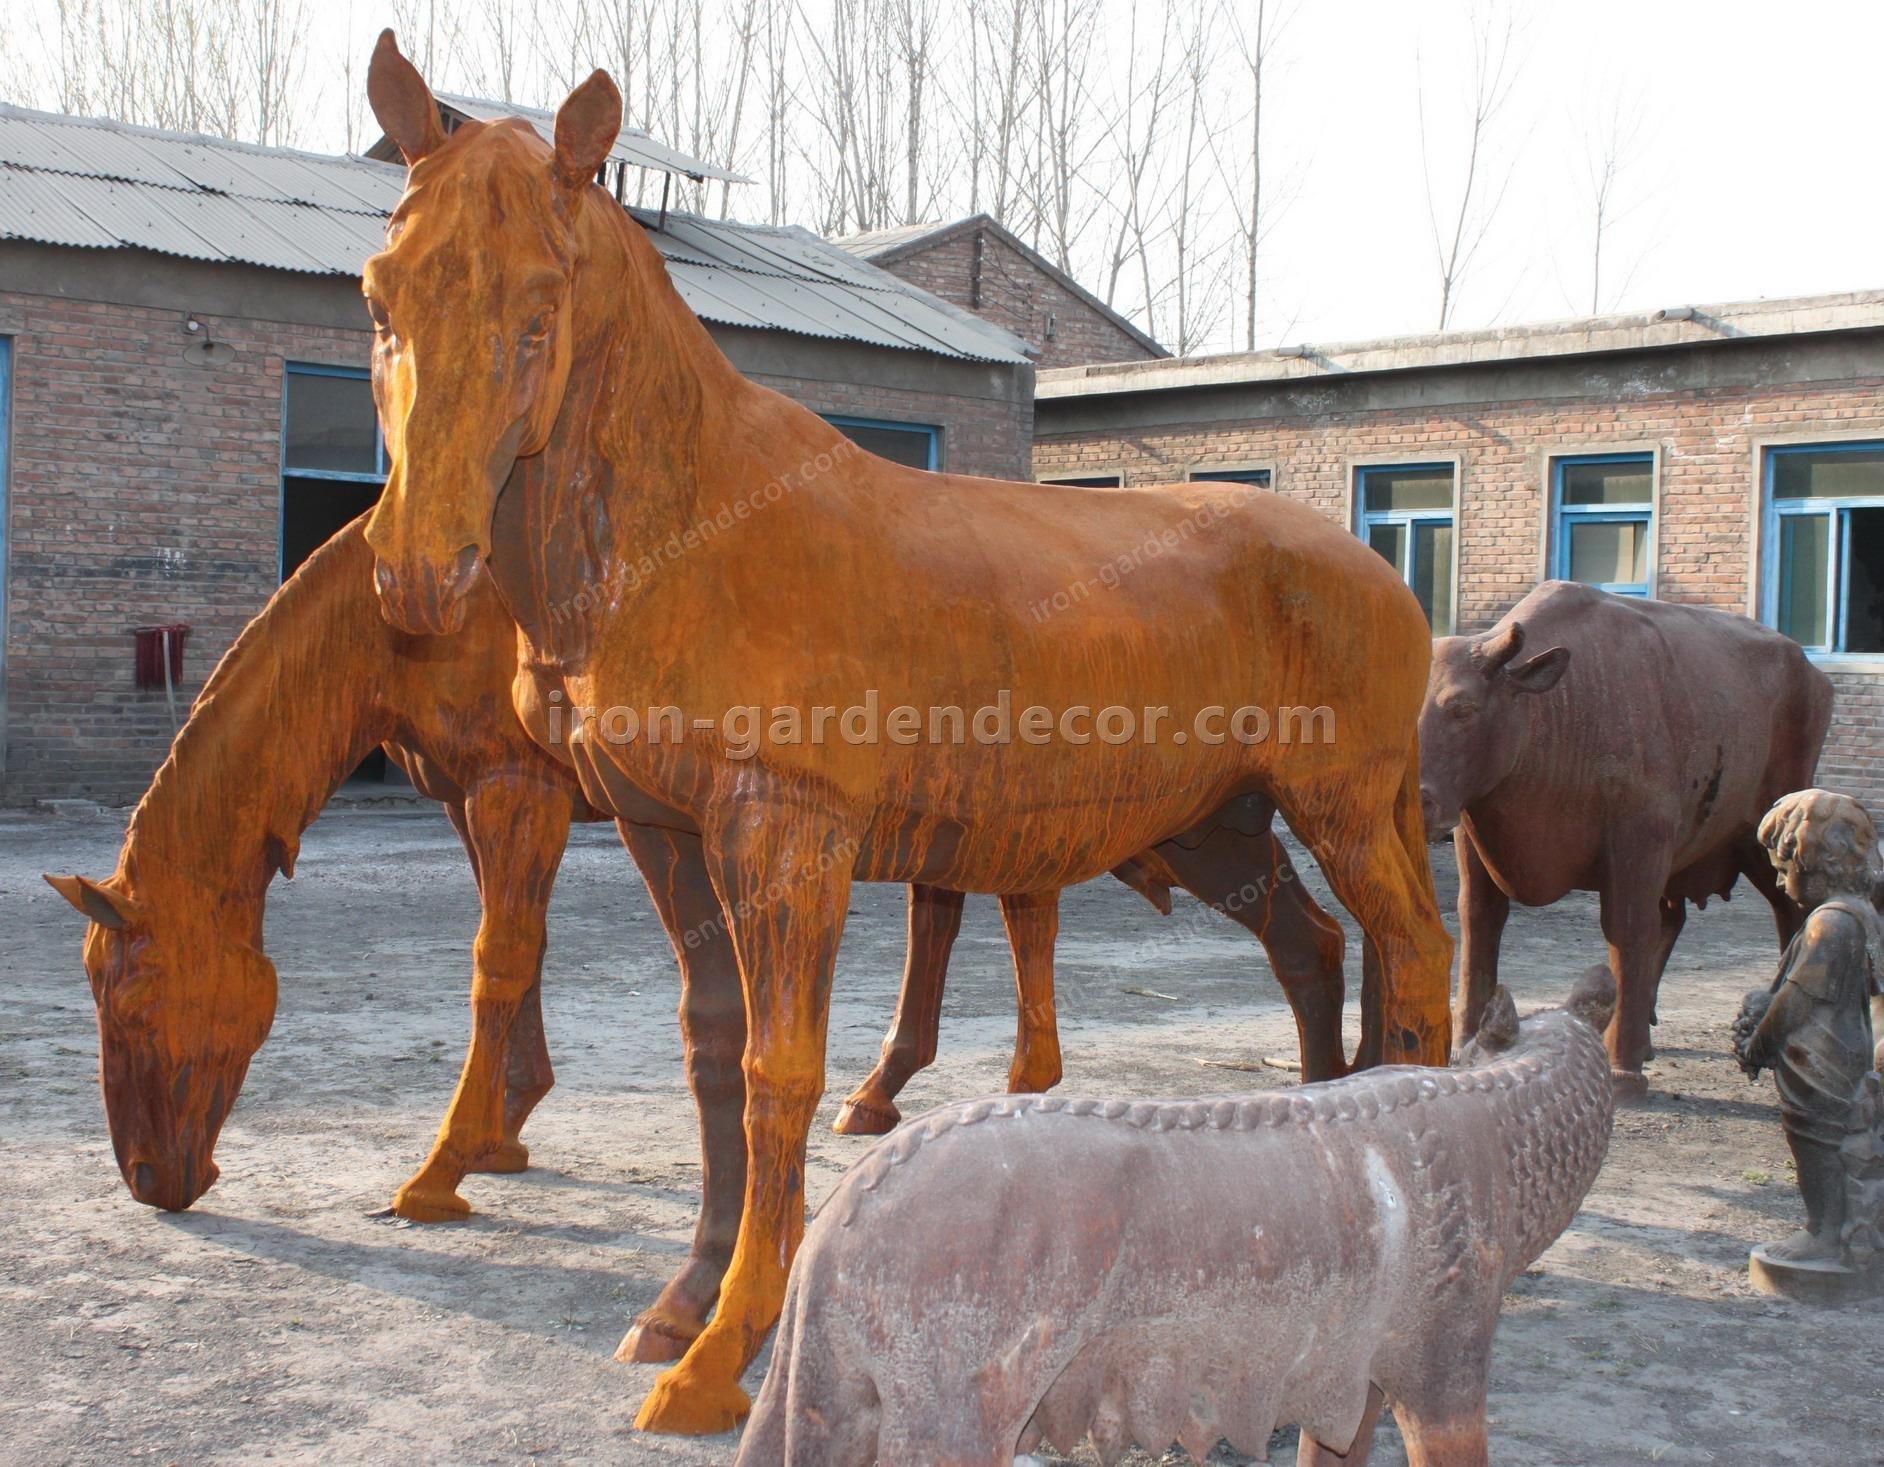 normal size cast iron animal of horse garden animal, large horse animal-G1275 (2)